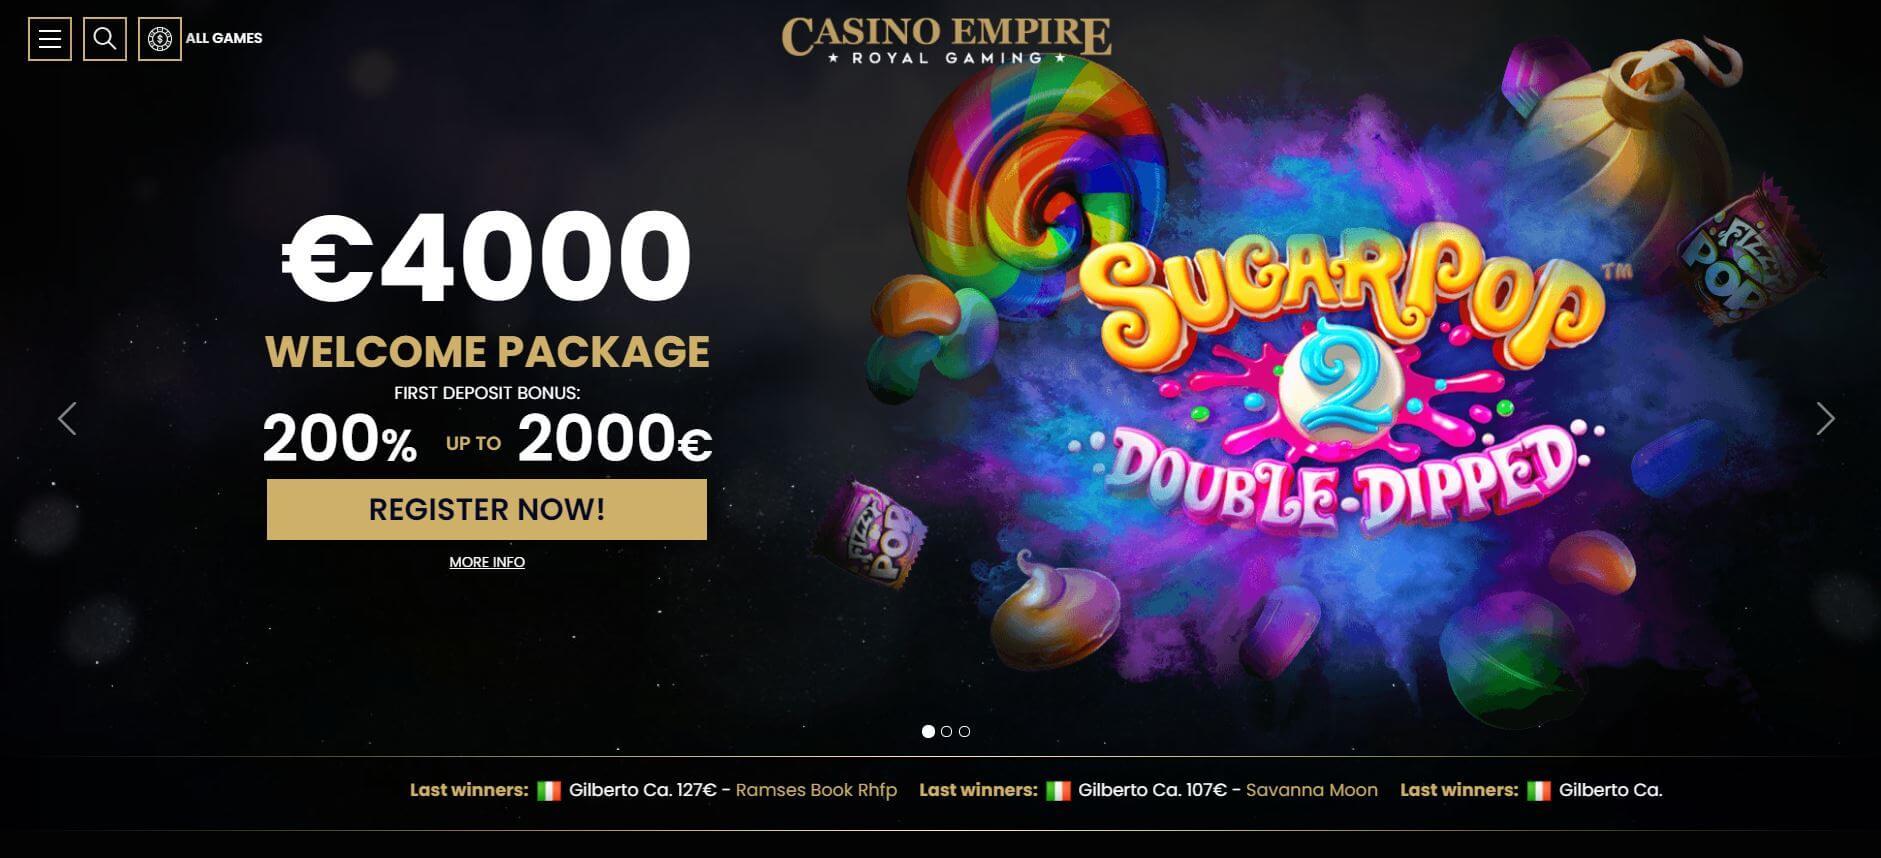 Casino Empire Homepage